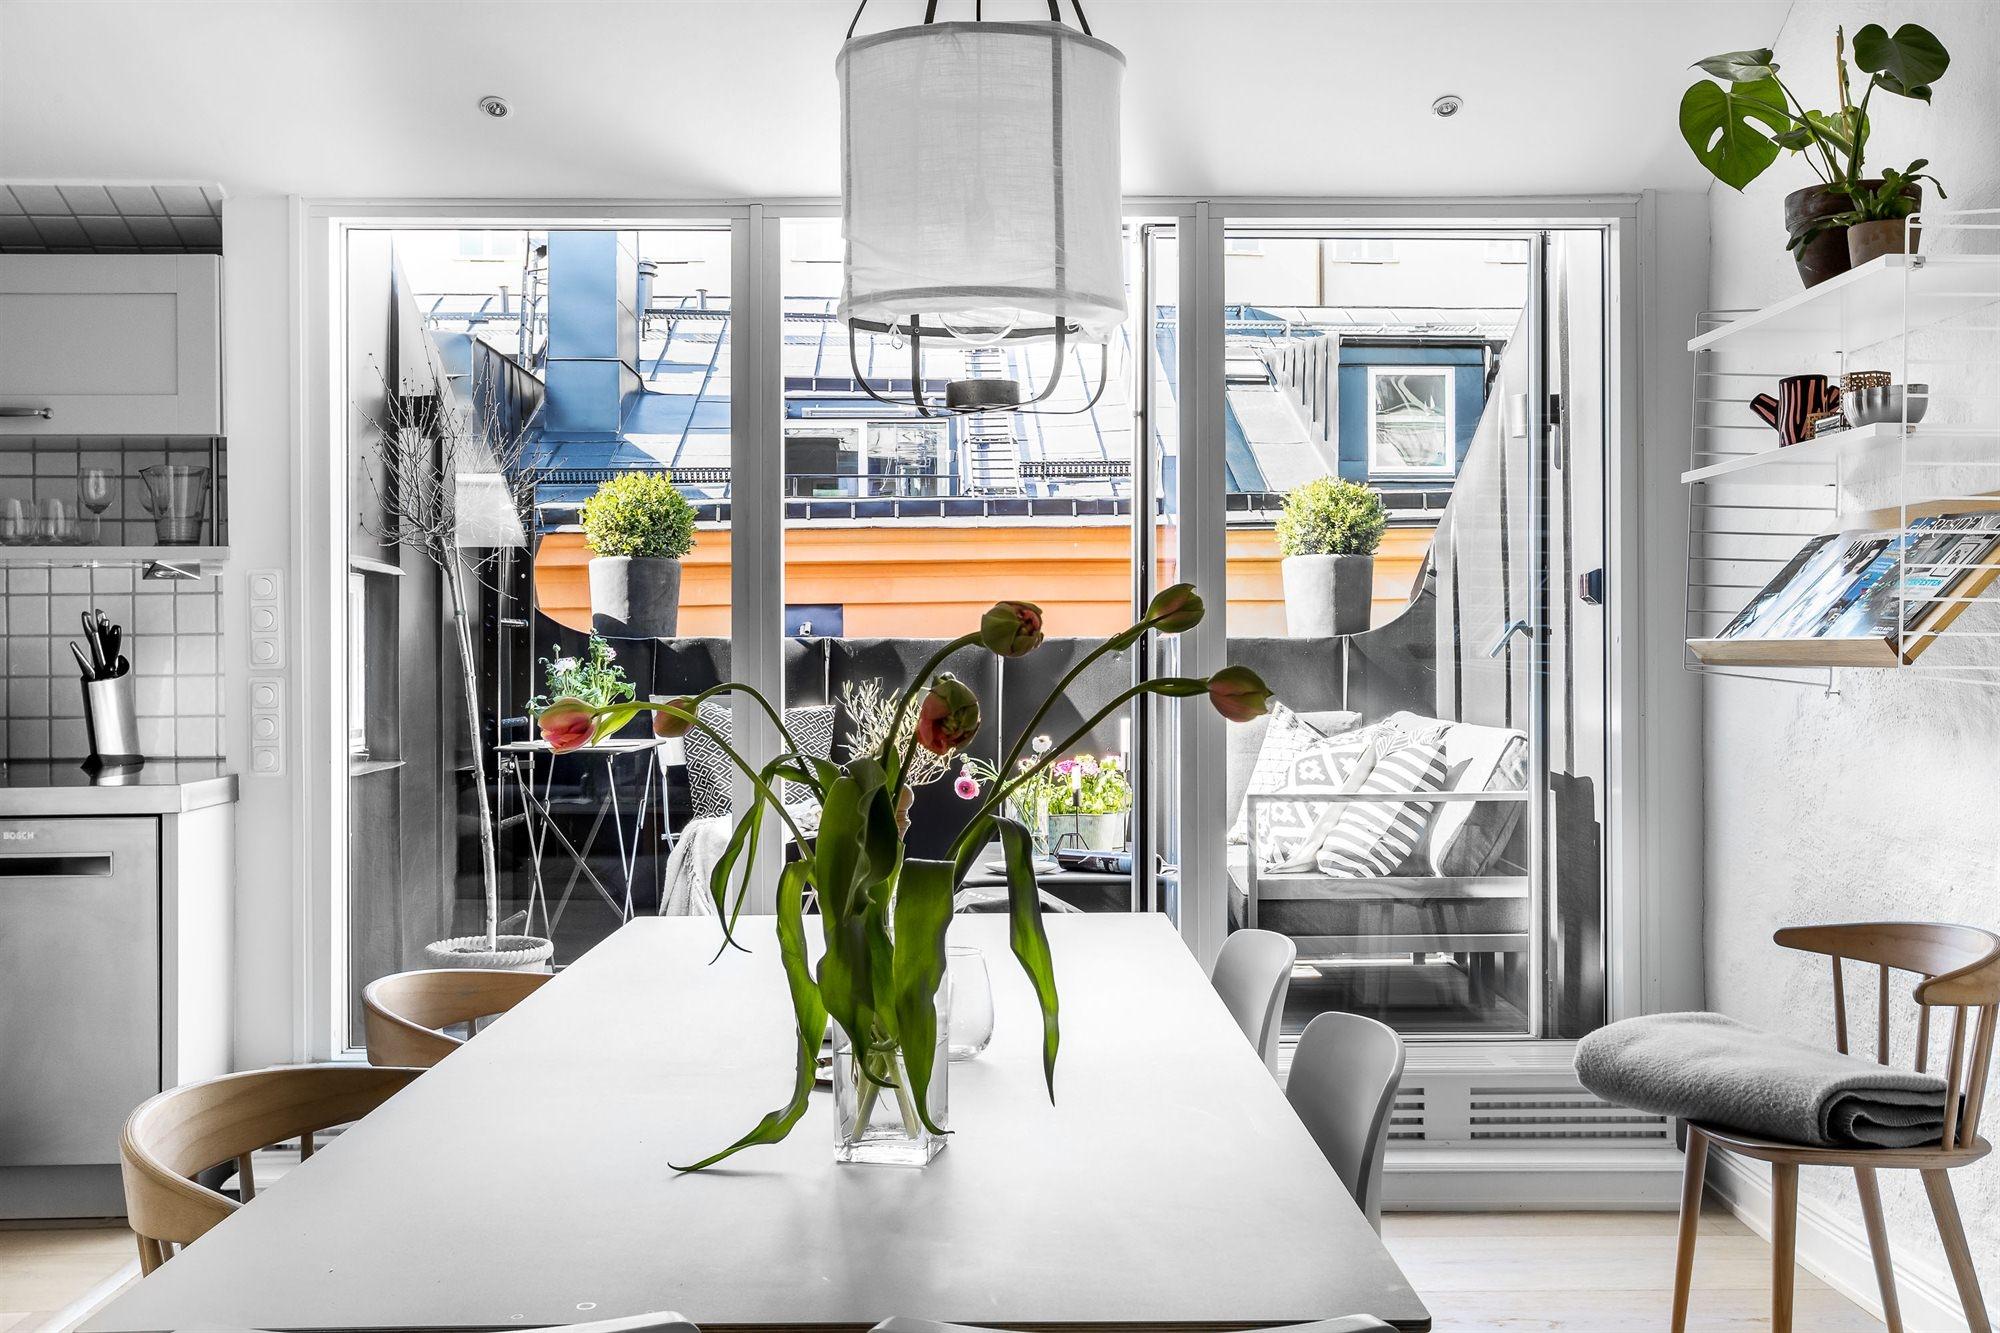 мансарда обеденный стол балкон